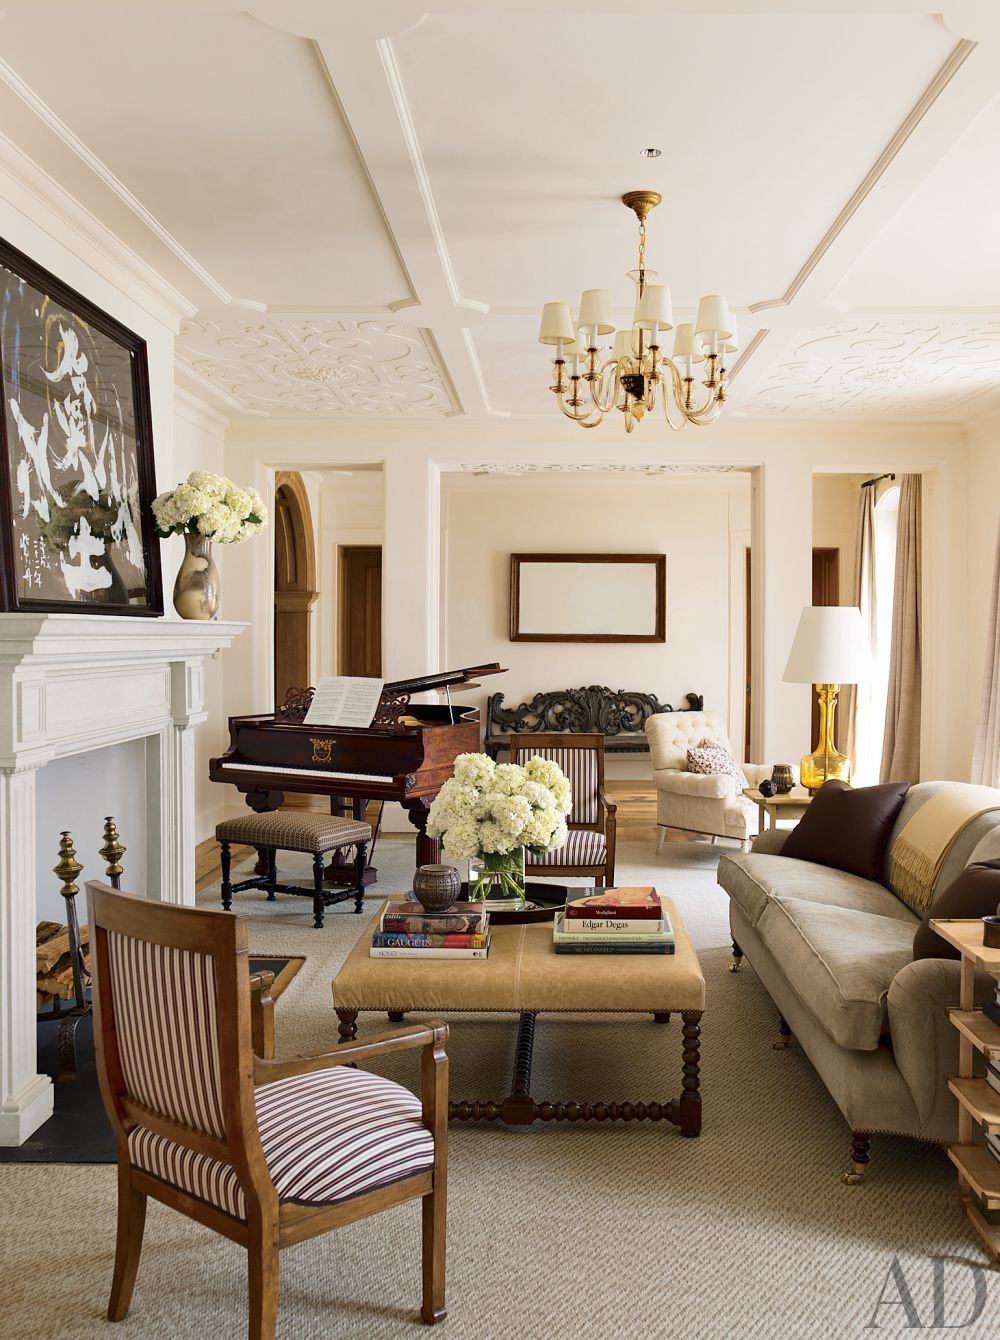 Ottoman Empire Via Archdigest Designfile Modern Living Room Interior Apartment Living Room College Living Rooms